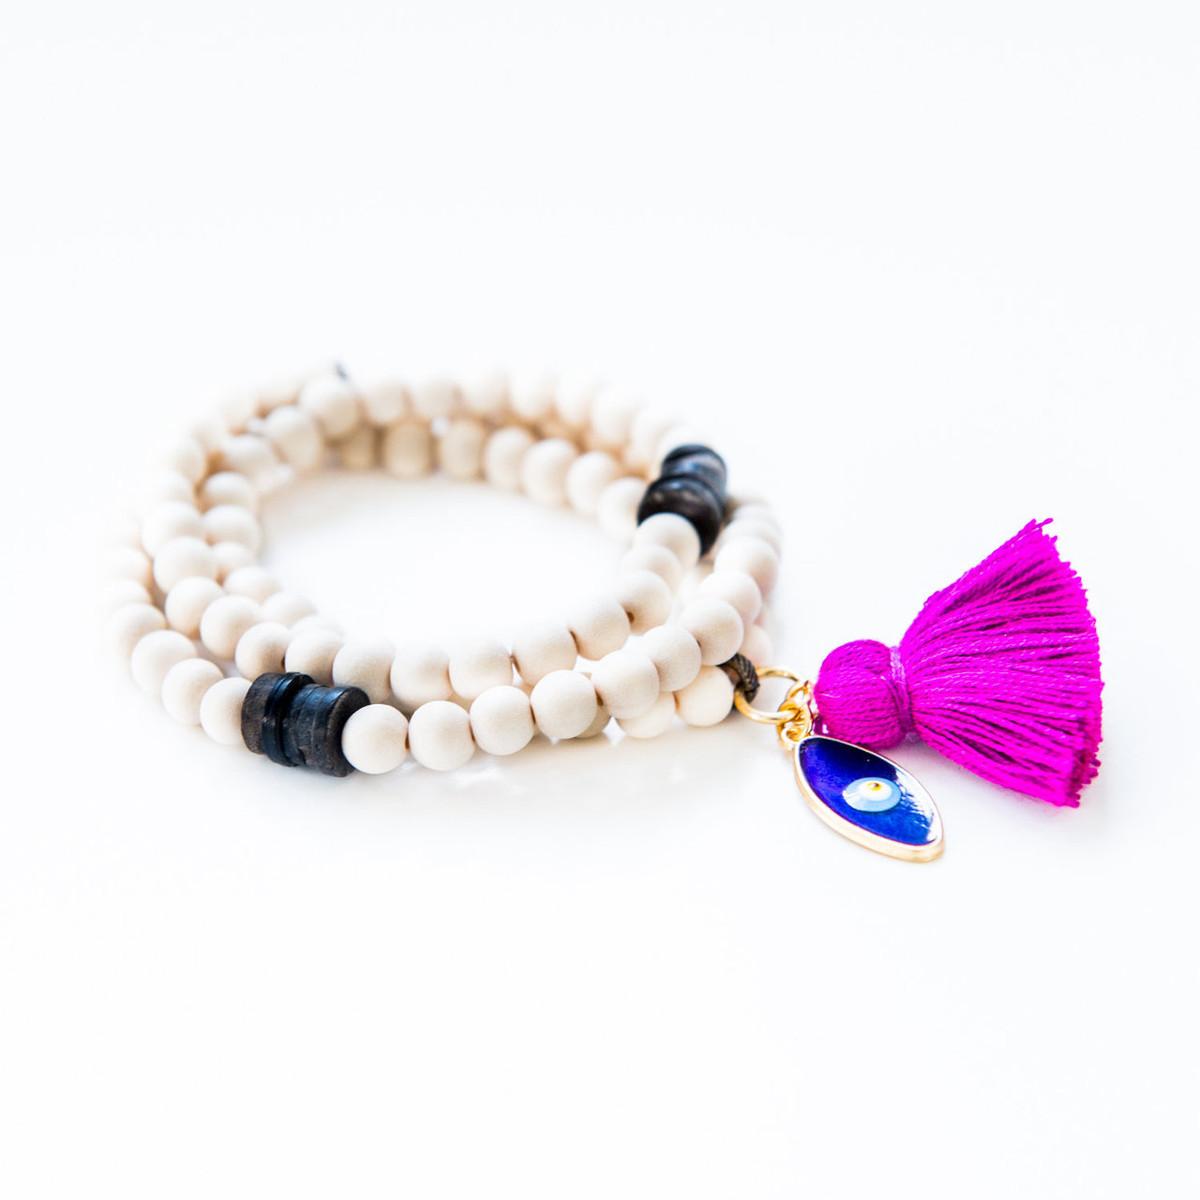 Triple Wrap White Wood Bracelet / Necklace Kabbalah Charm From 7Stitches